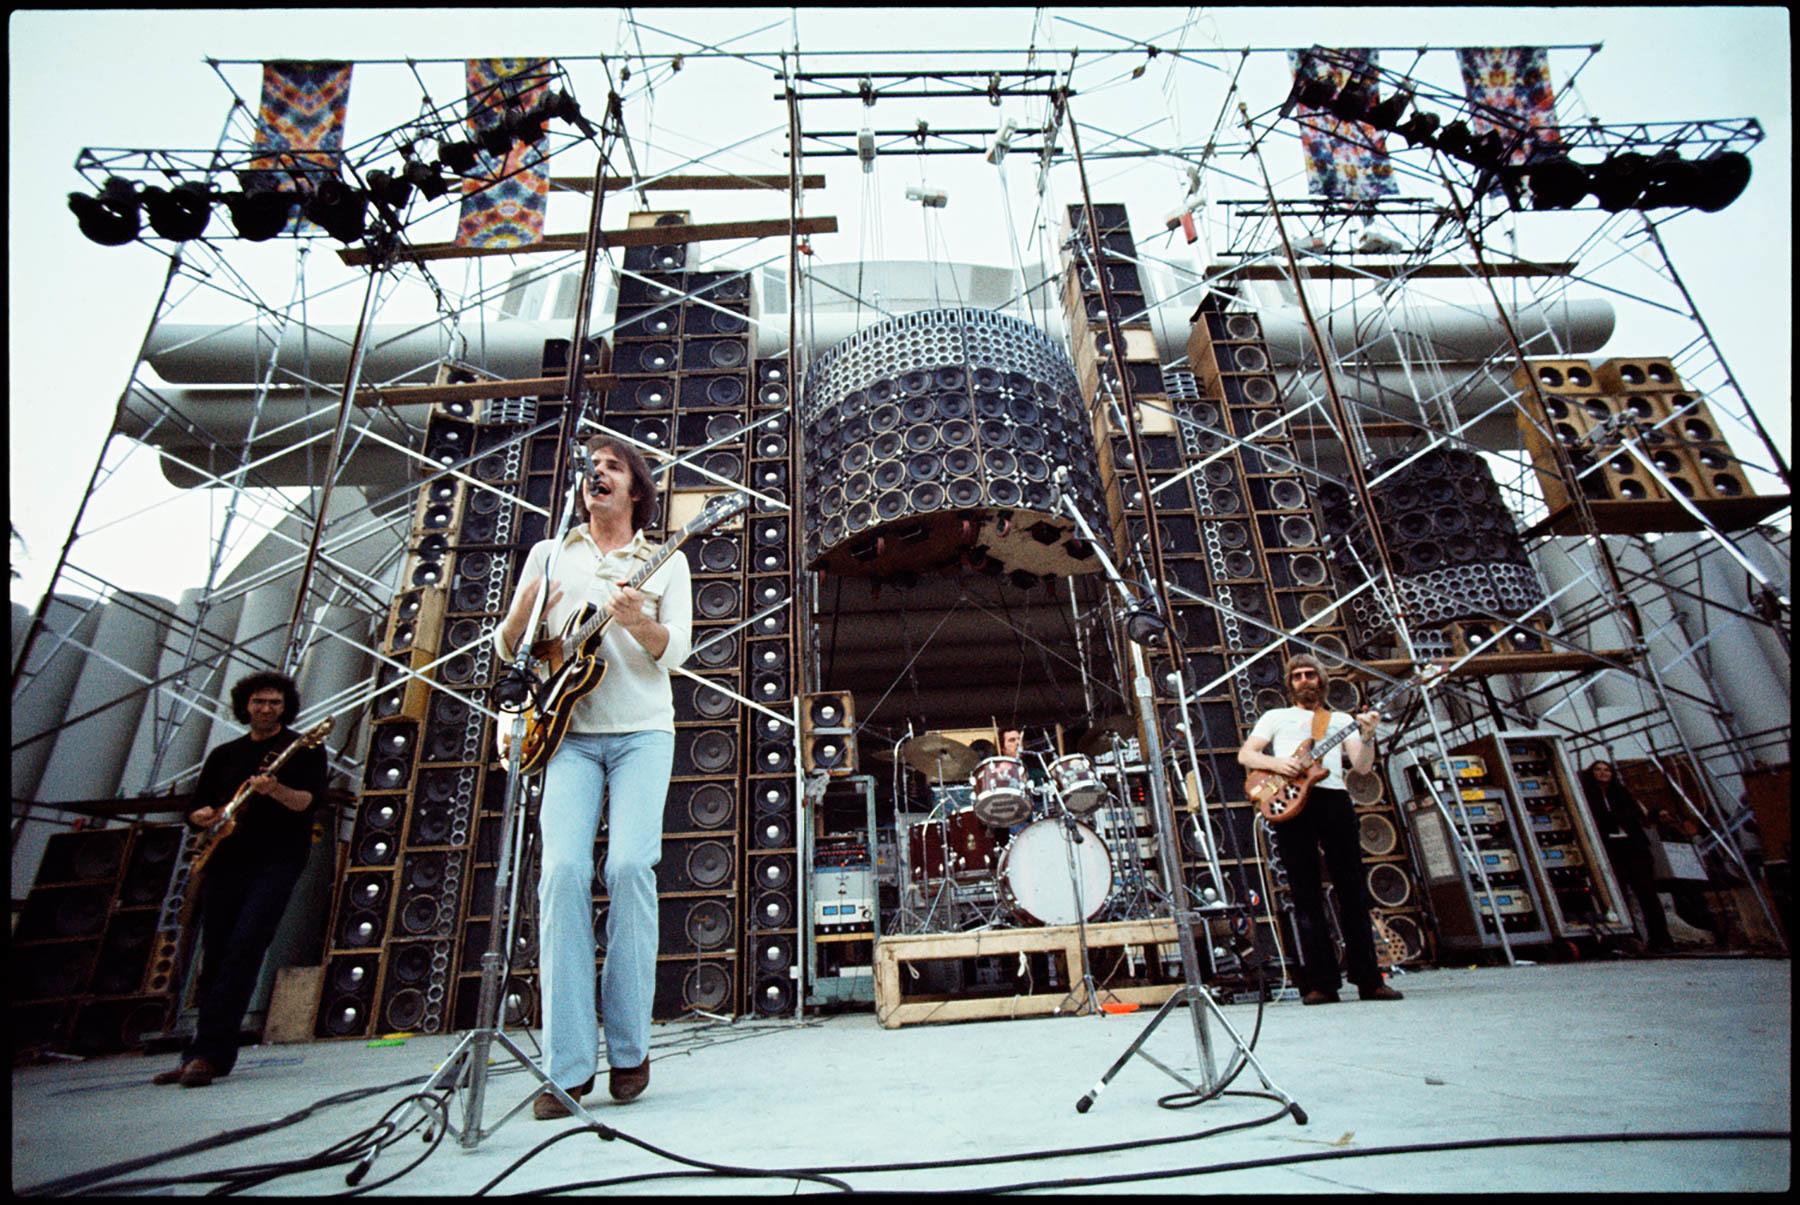 Jerry Garcia, Bill Kreutzmann, Phil Lesh, and Bob Weir in Long Strange Trip (2017)